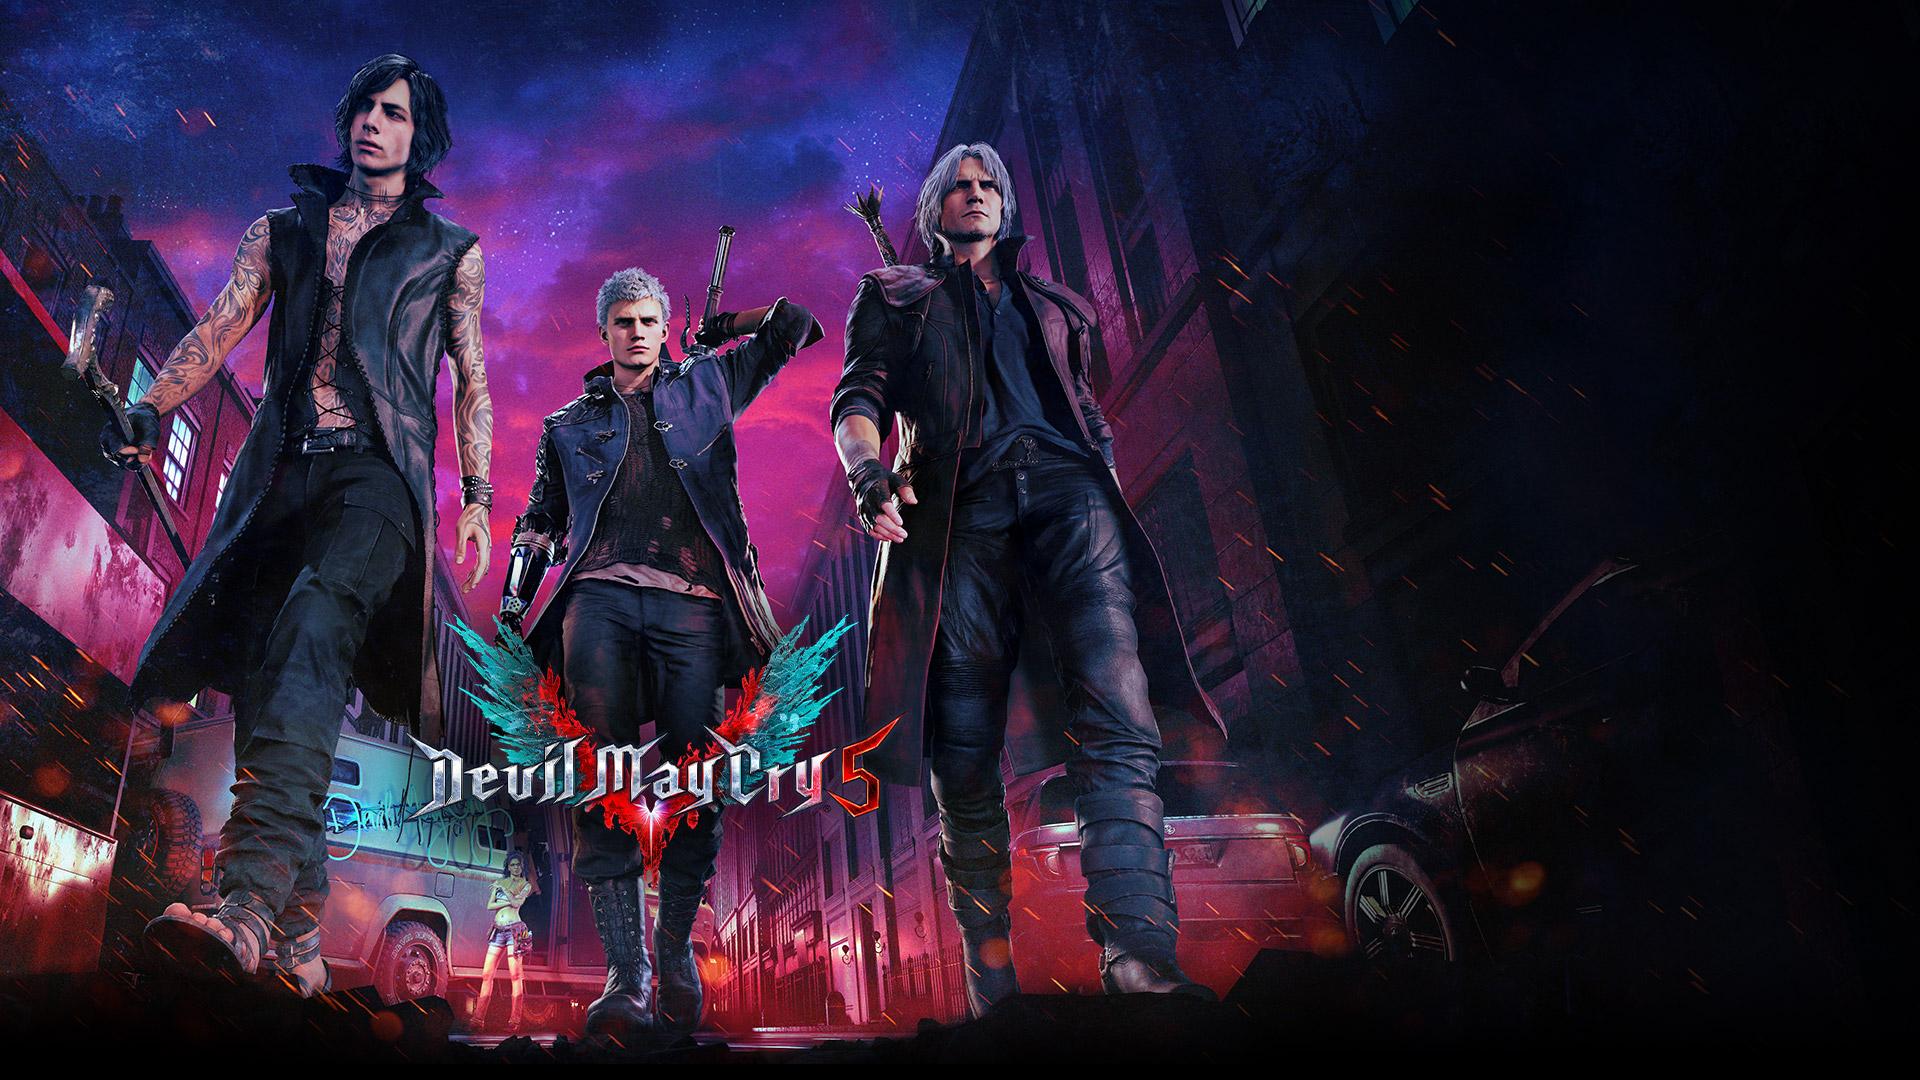 Devil May Cry 5, Demon hunters Nero, Dante, and V walk down a street